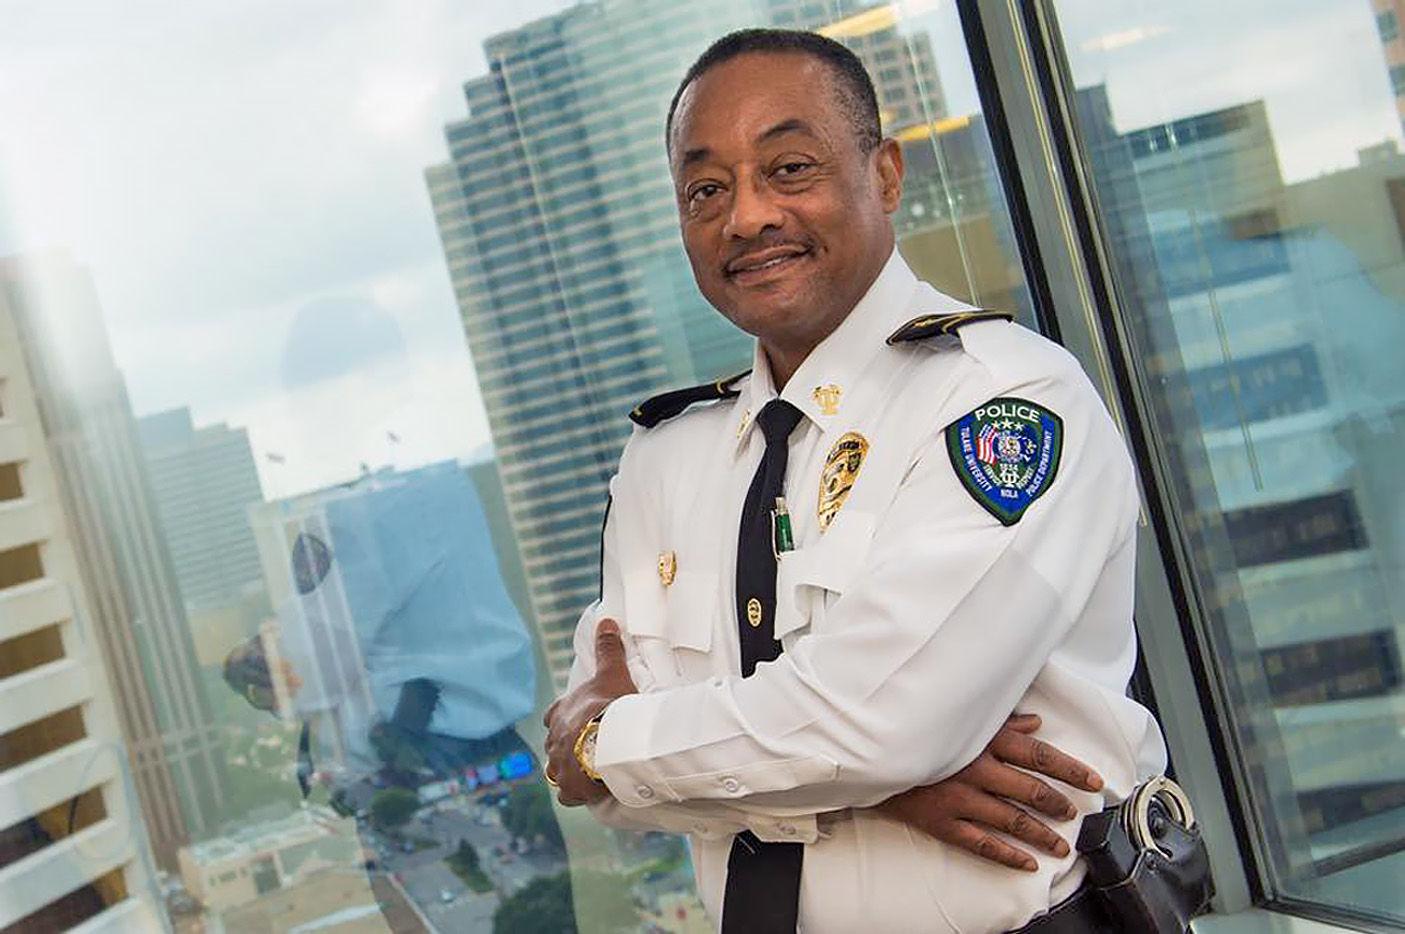 Tulane University Police Department Police Chief Joseph